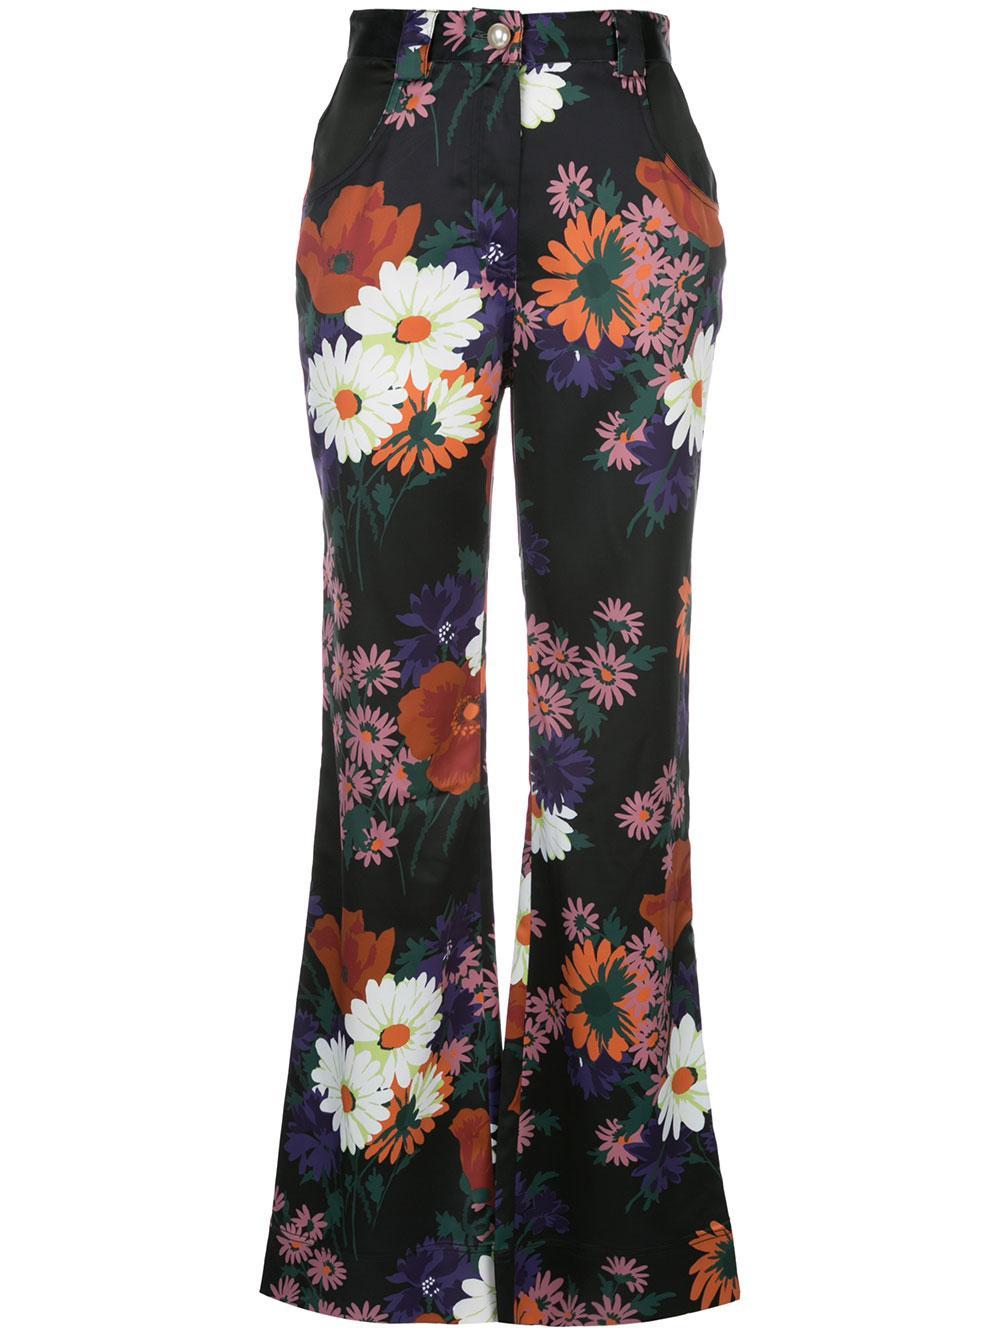 Austin Floral Pant Item # 131-6050-BFLR